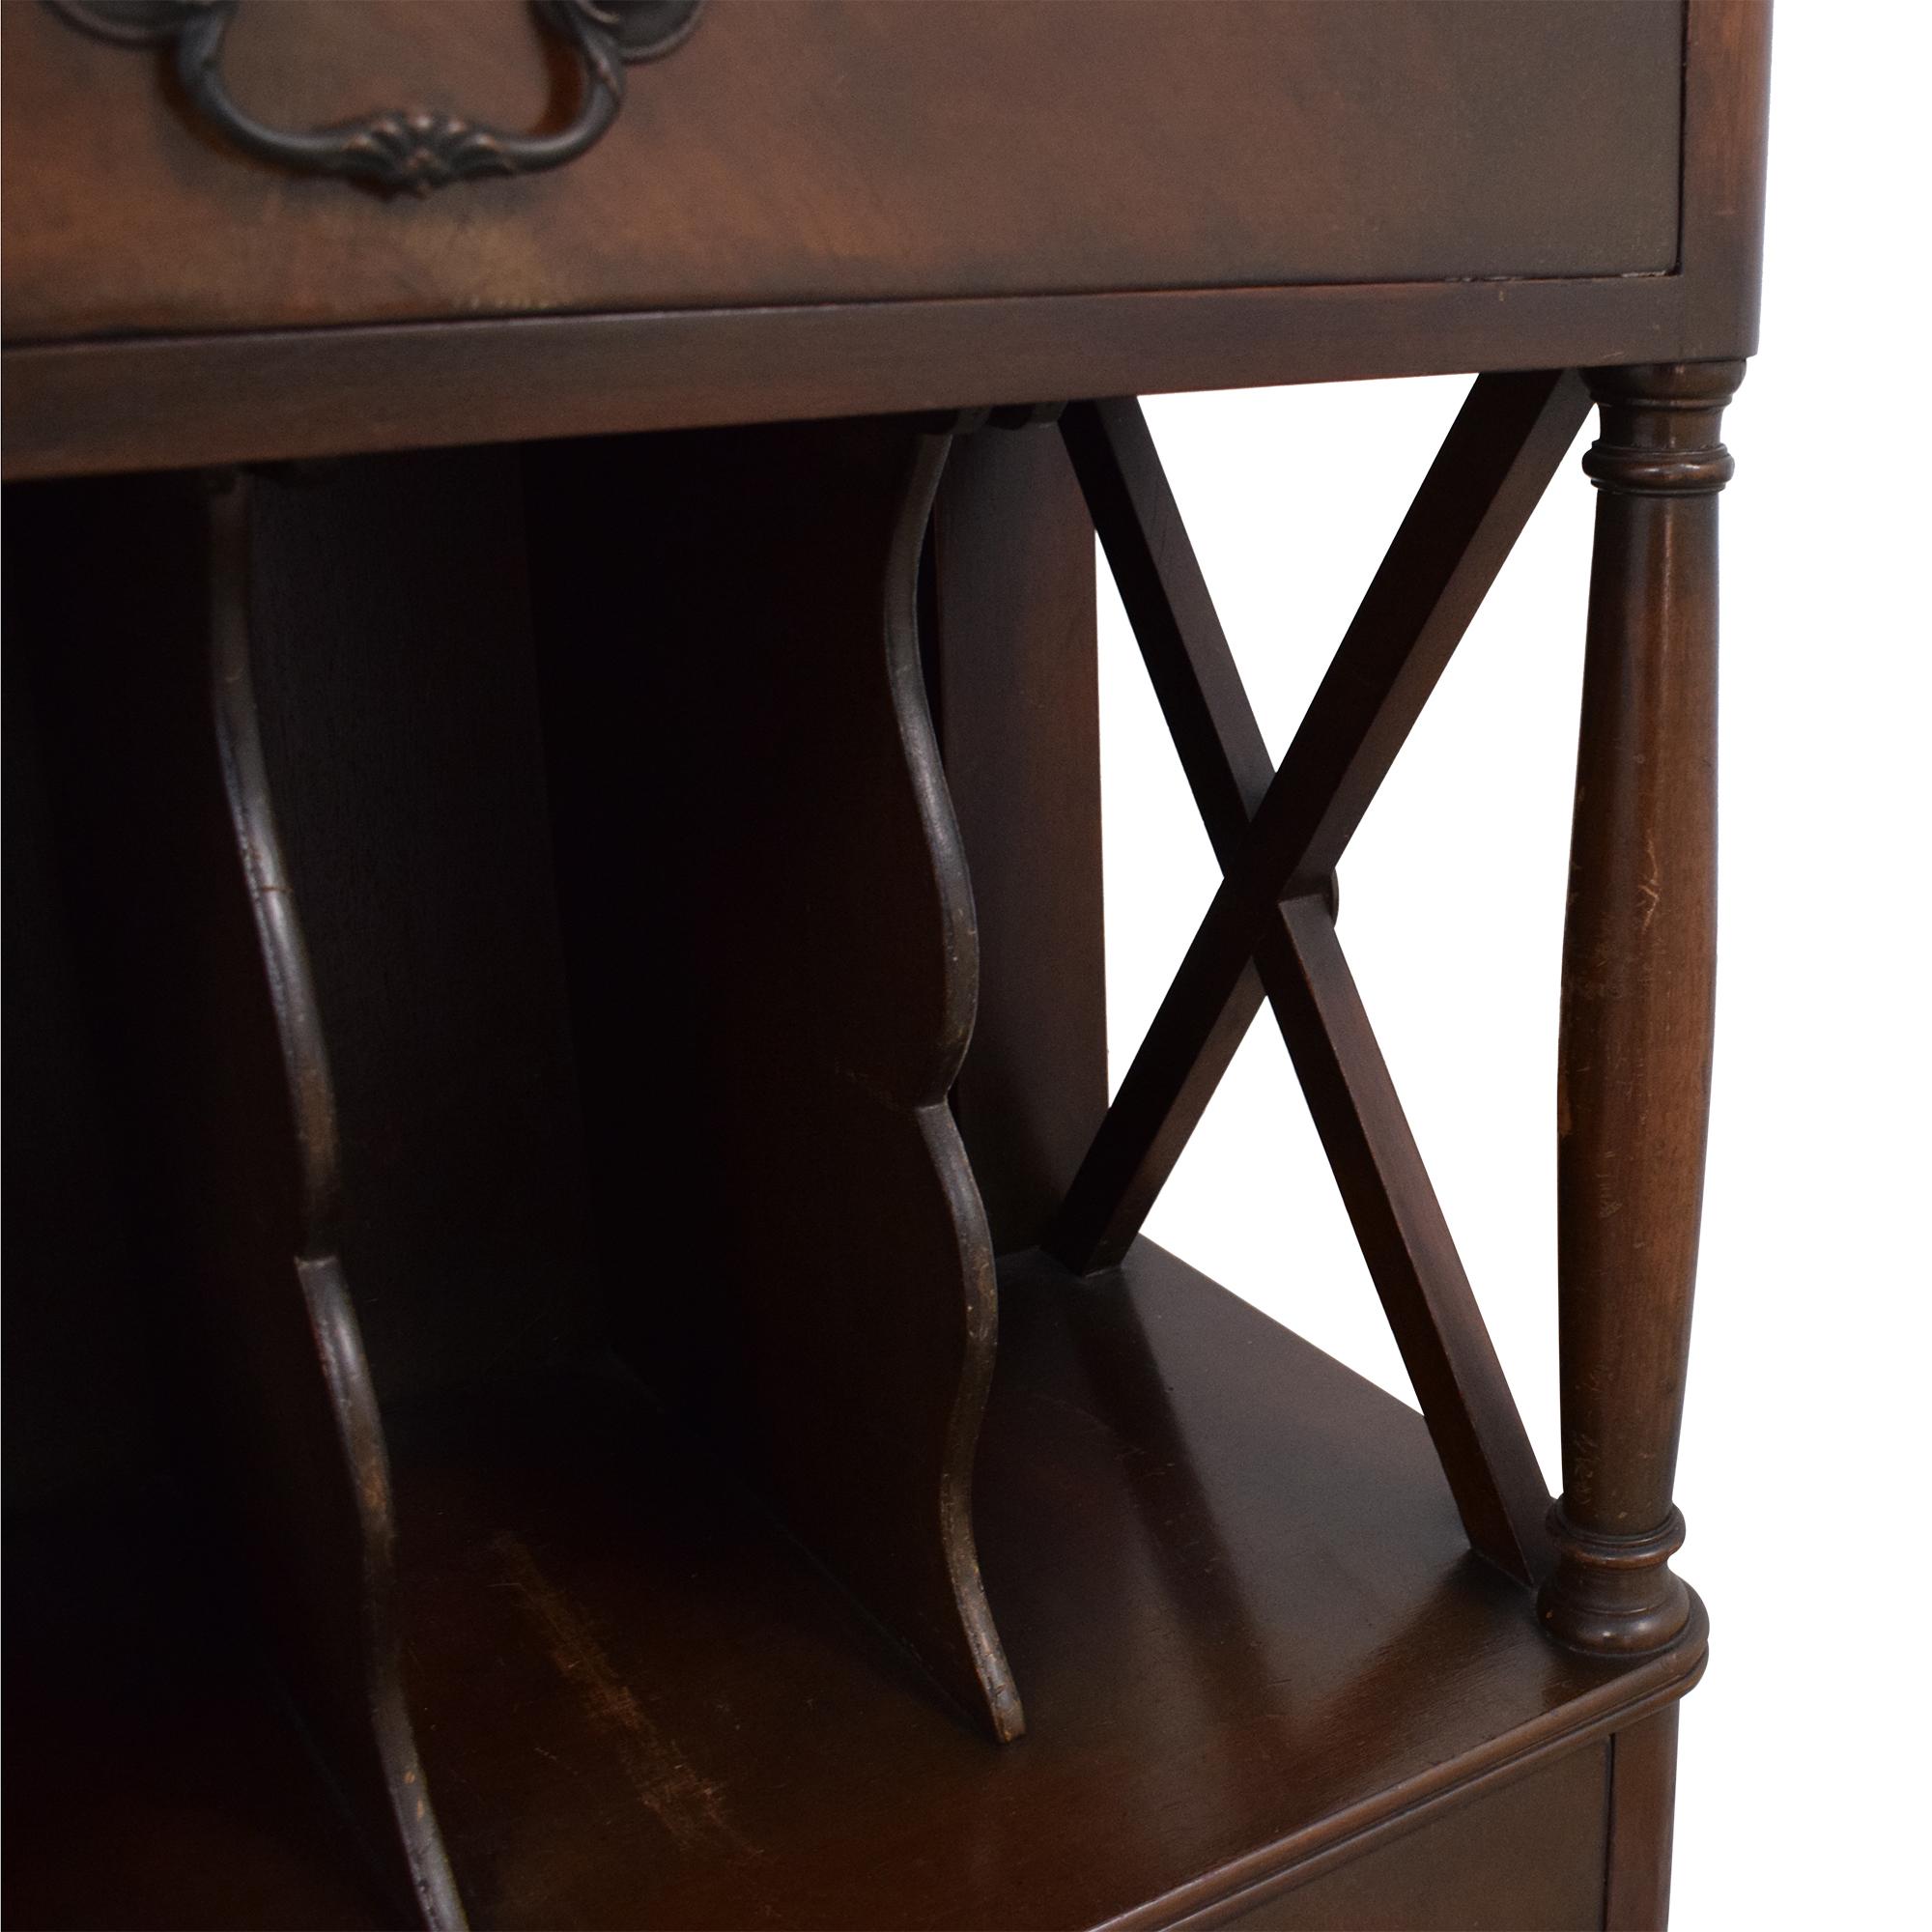 Vintage Four Drawer Sideboard used